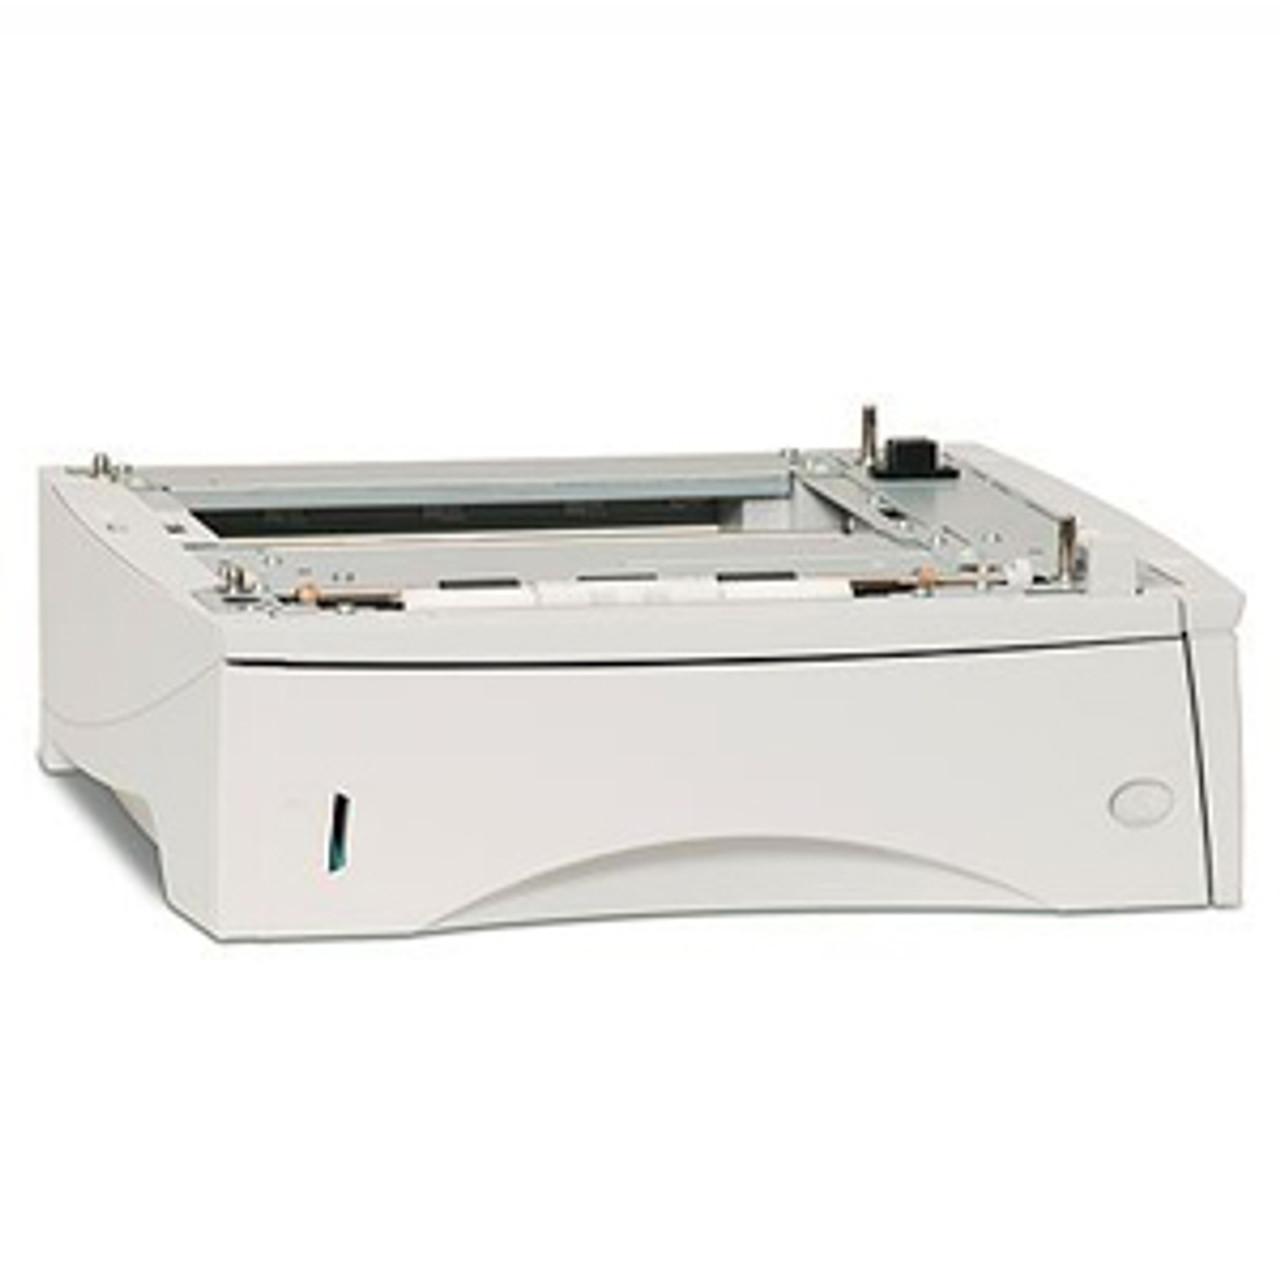 HP LaserJet 500 Sheet Tray 4240 4250 4350 - Q2440B - HP Paper Tray for sale